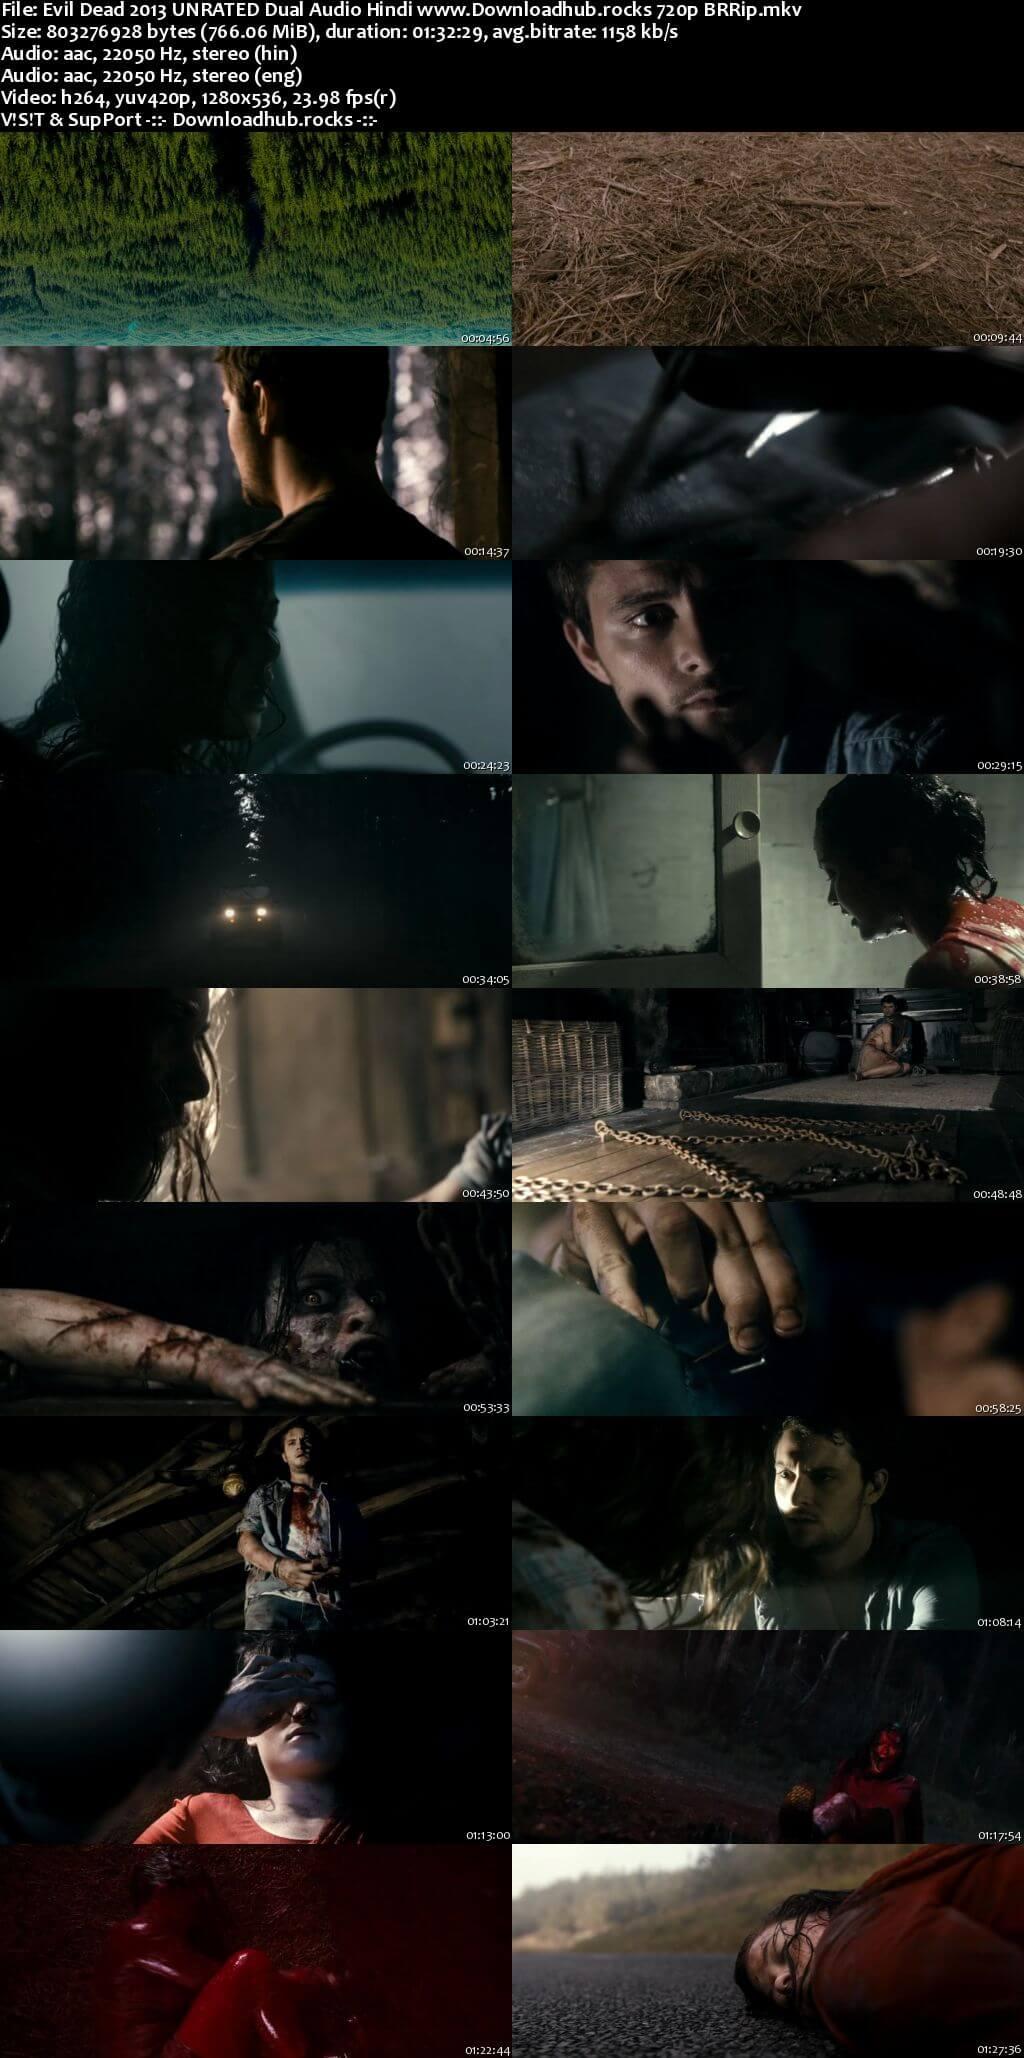 Evil Dead 2013 Hindi Dual Audio 720p BluRay x264